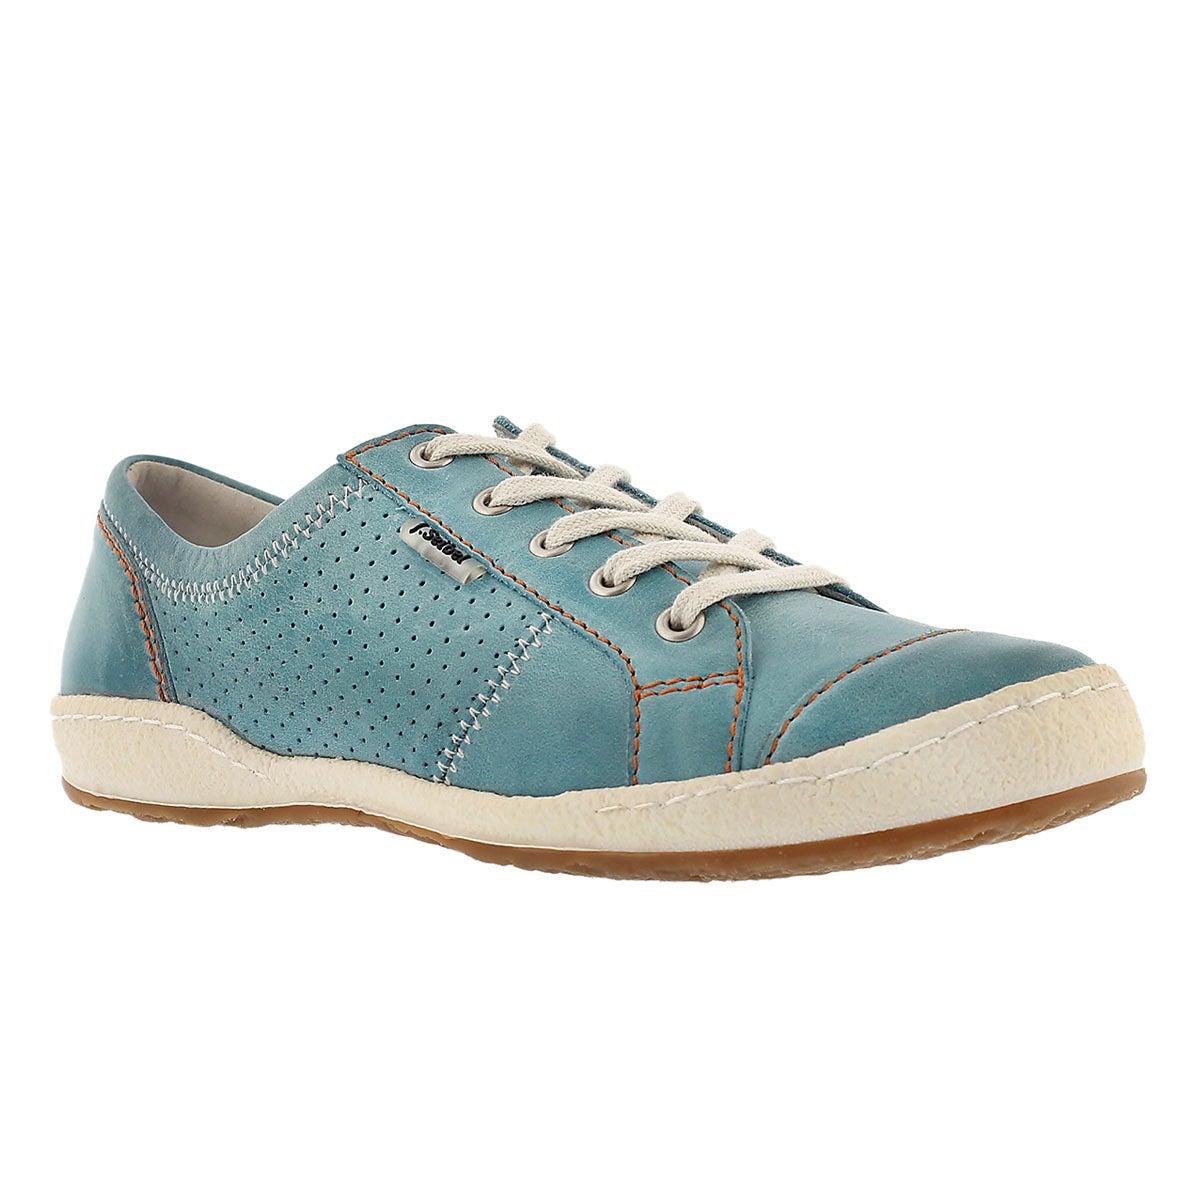 Lds Caspian lagoon lace up shoe